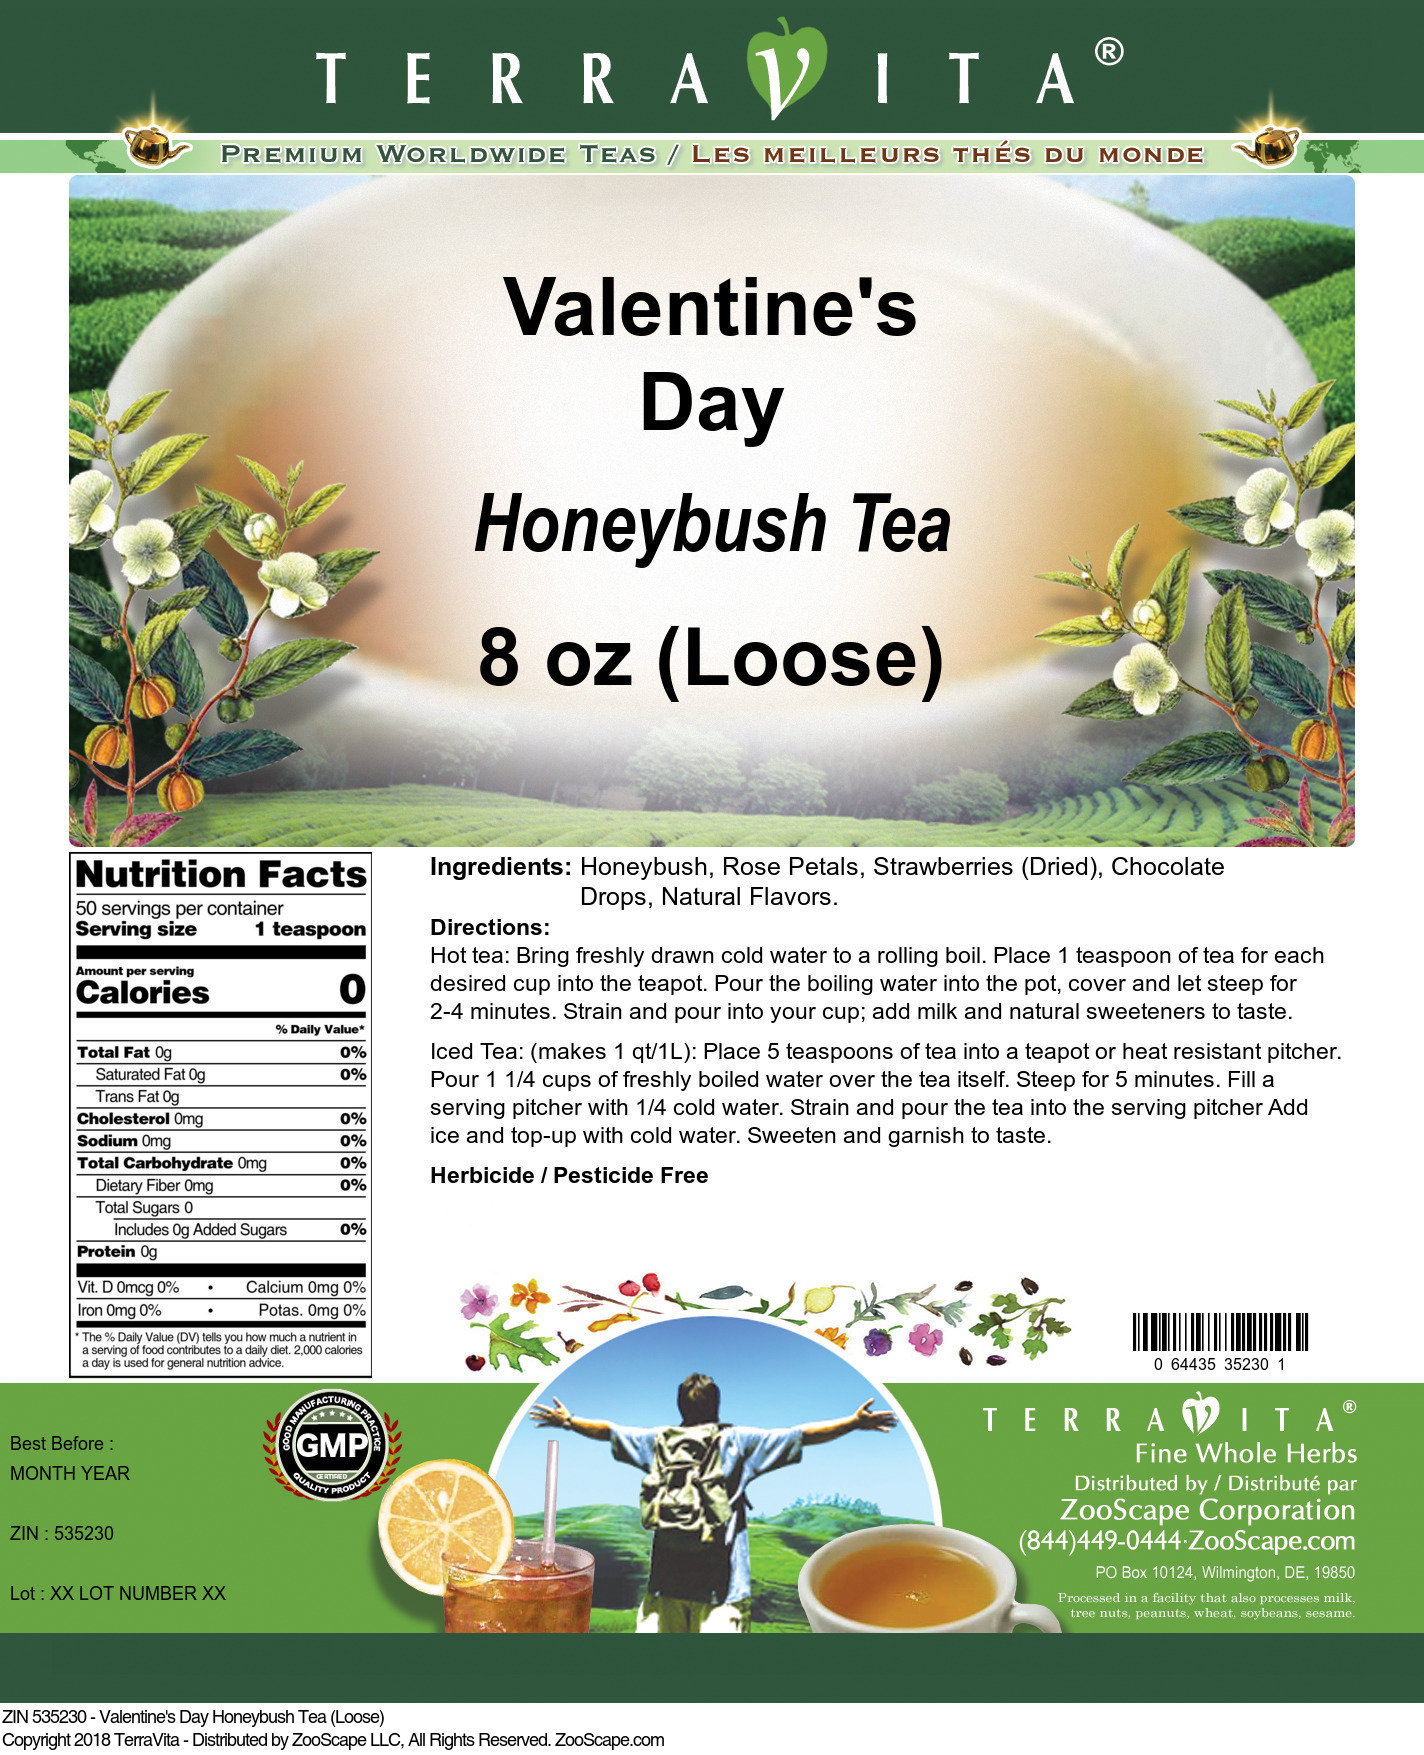 Valentine's Day Honeybush Tea (Loose)